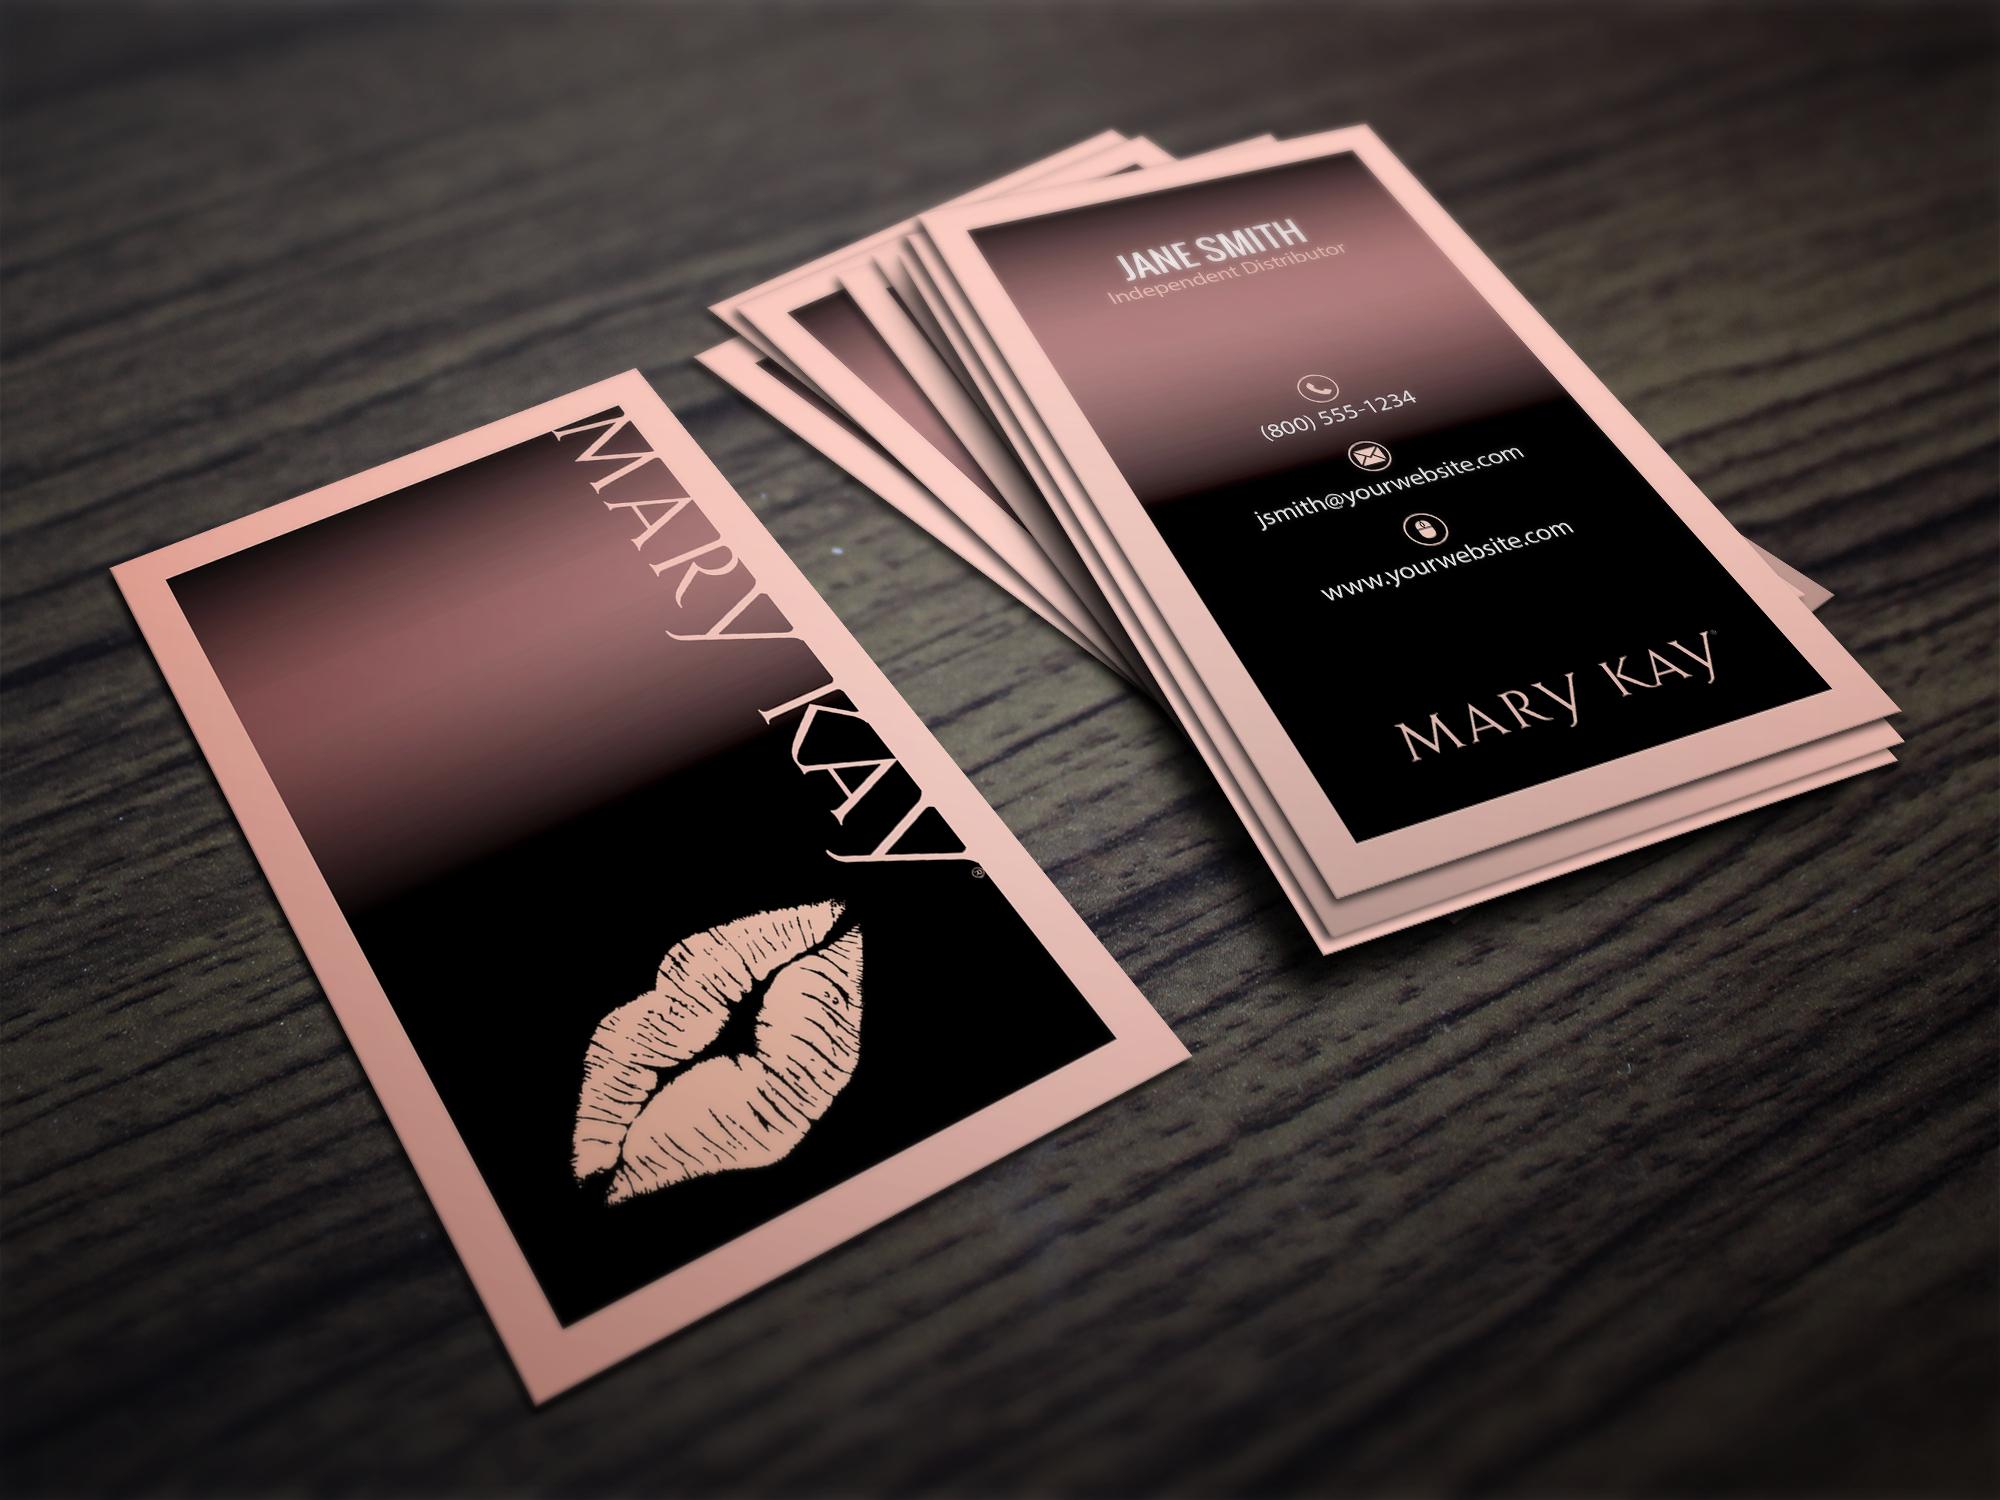 Mary Kay Business Cards | Mary Kay | Pinterest | Mary Kay, Mary Kay - Free Printable Mary Kay Business Cards